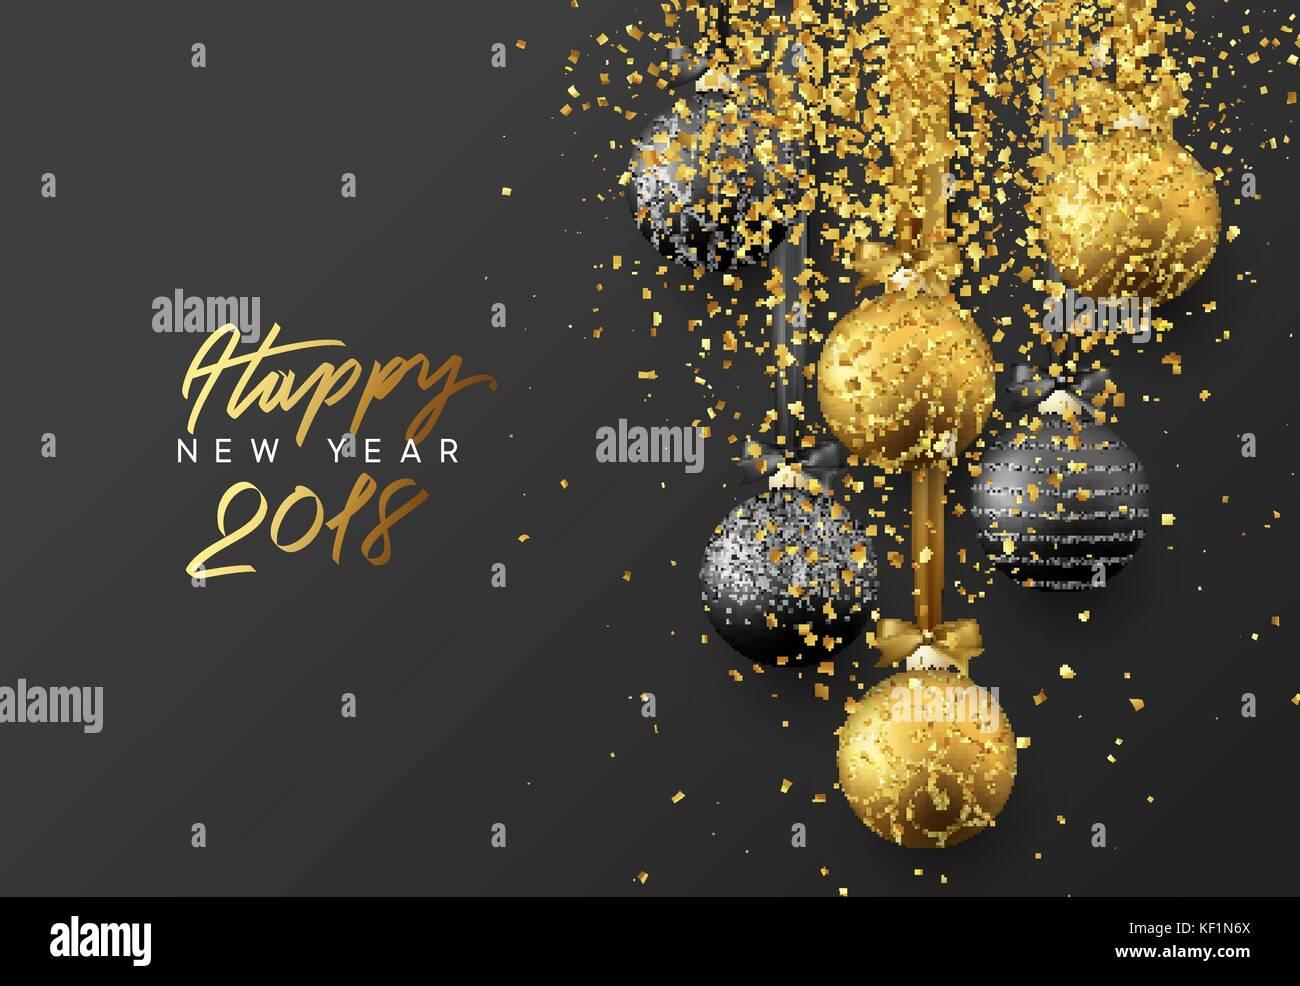 Happy New Year 2018 Christmas Greeting Card Design Of Xmas Balls